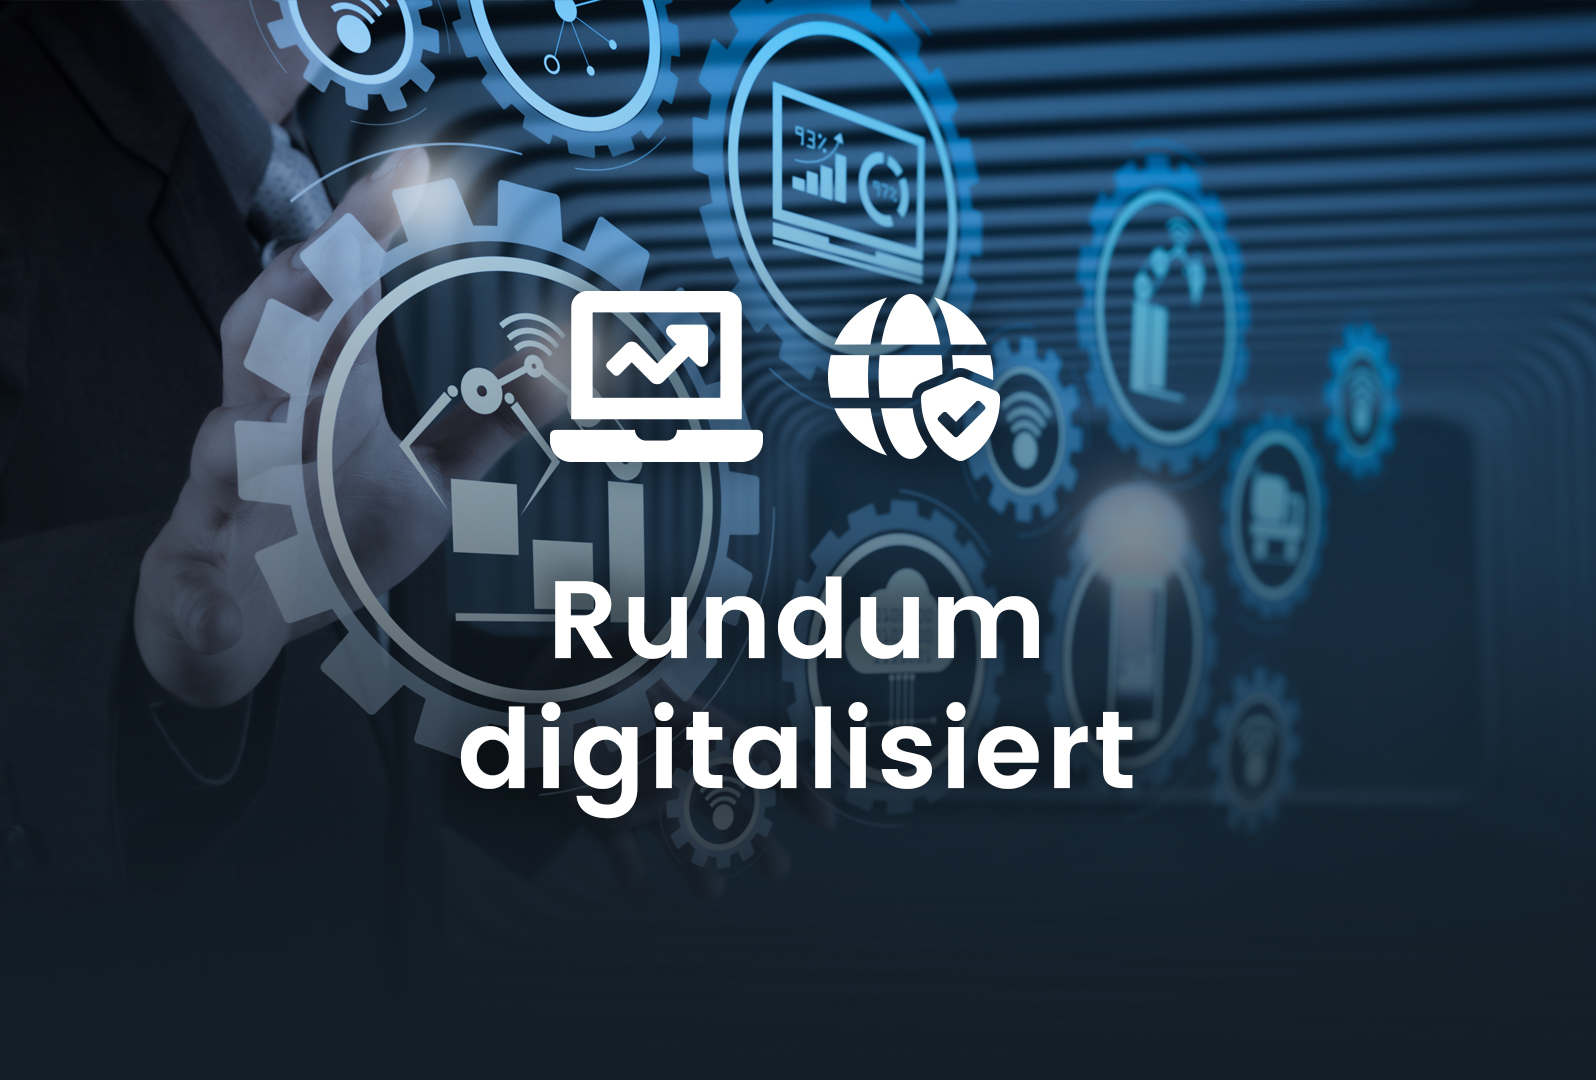 Rundum digitalisiert